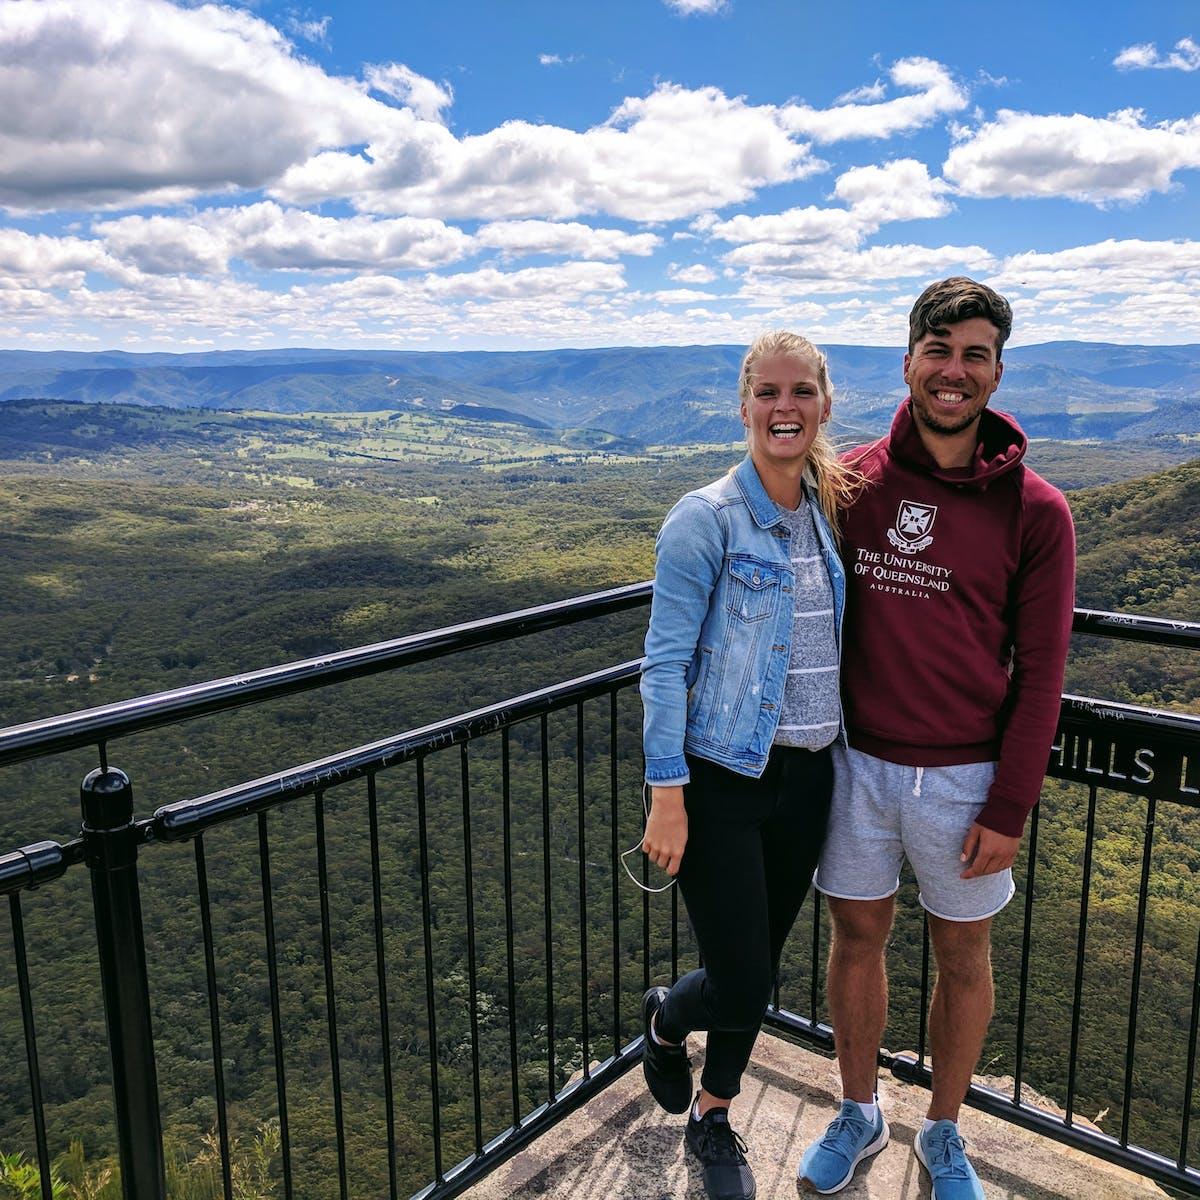 Us in the Blue Mountains, Australia (2018)